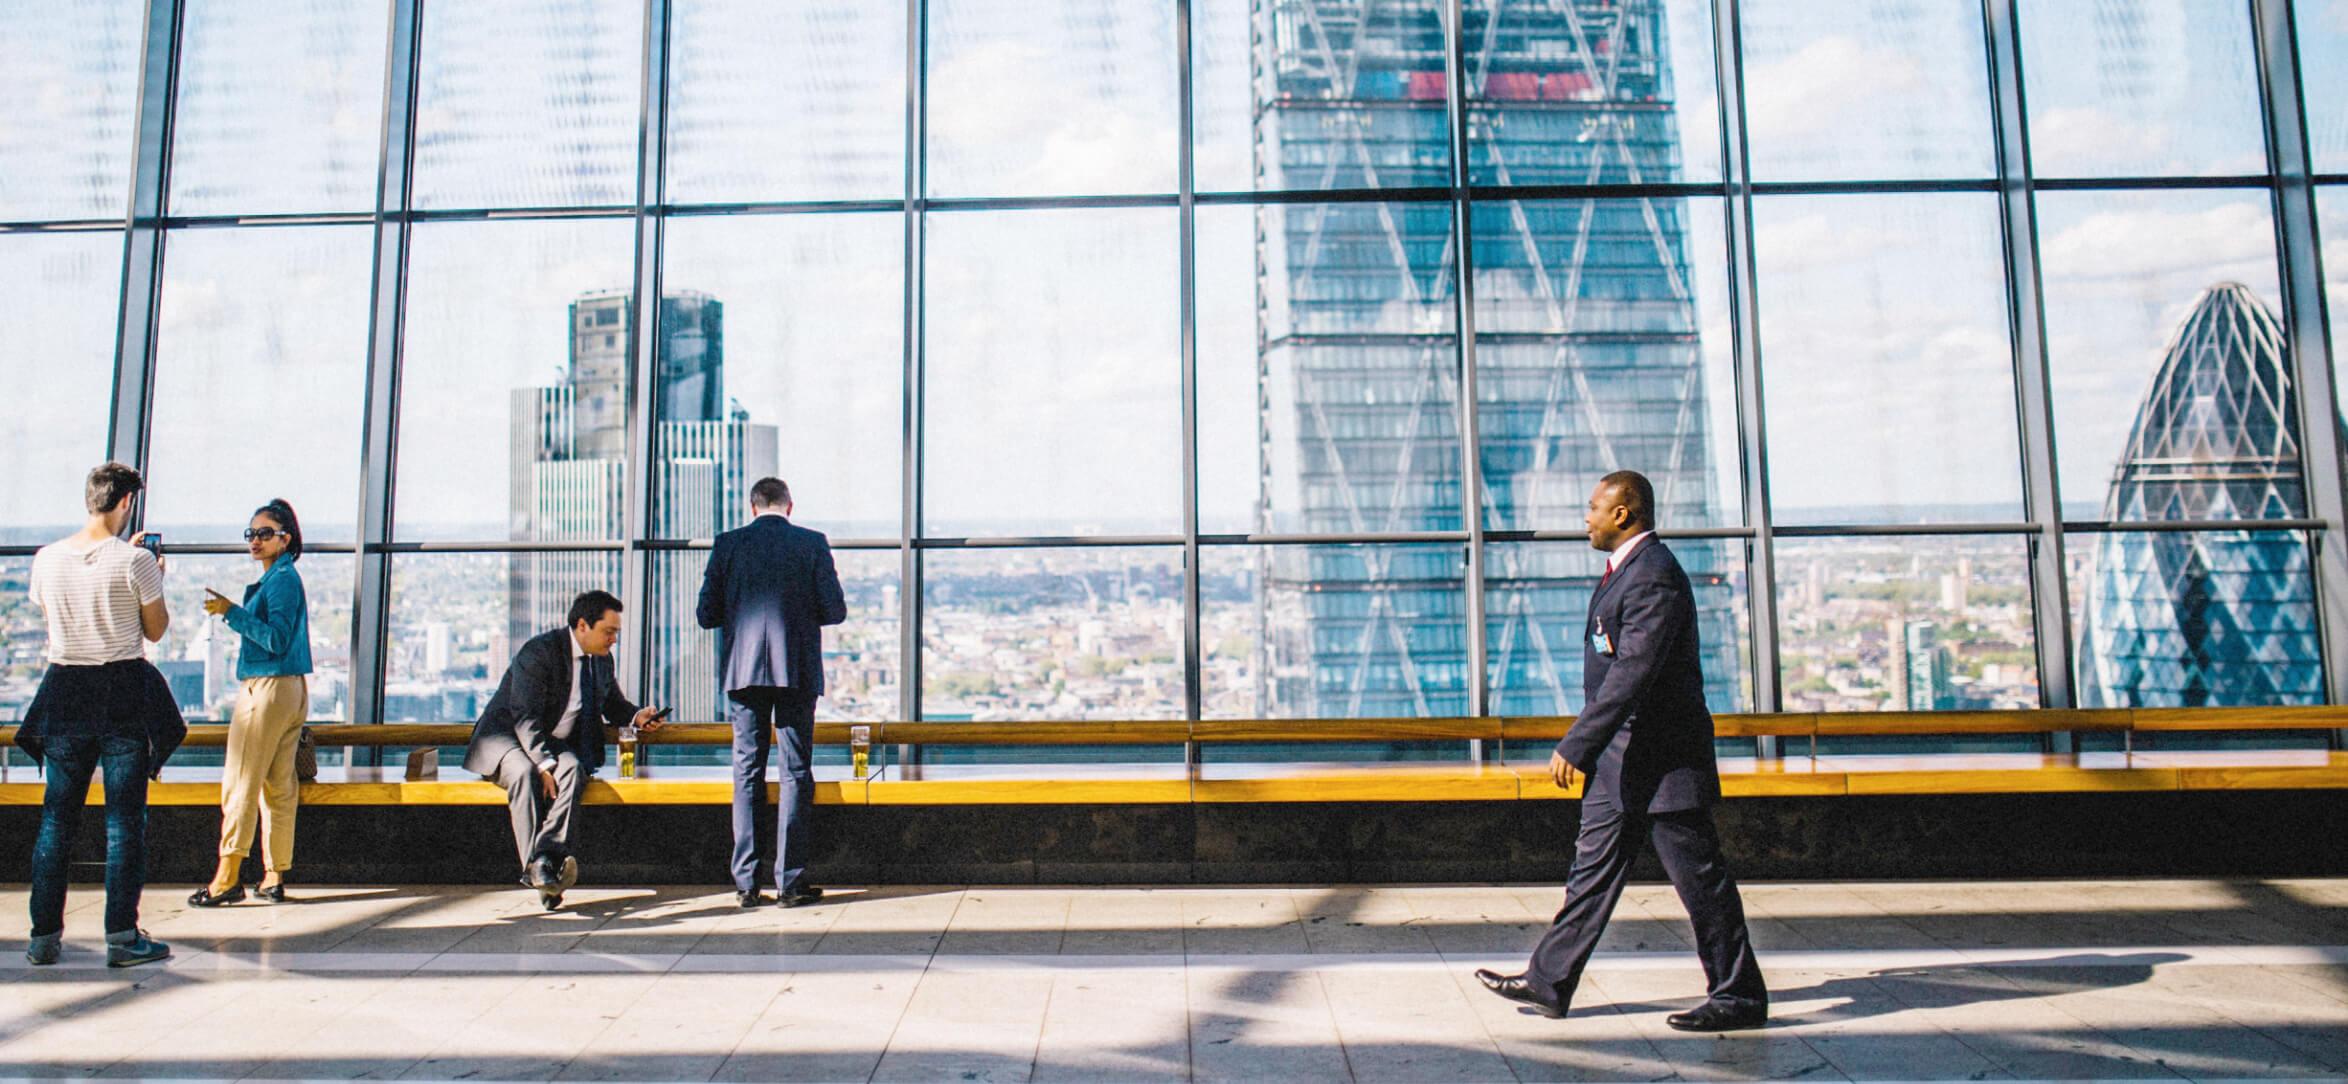 Business man walking in a beautiful building.